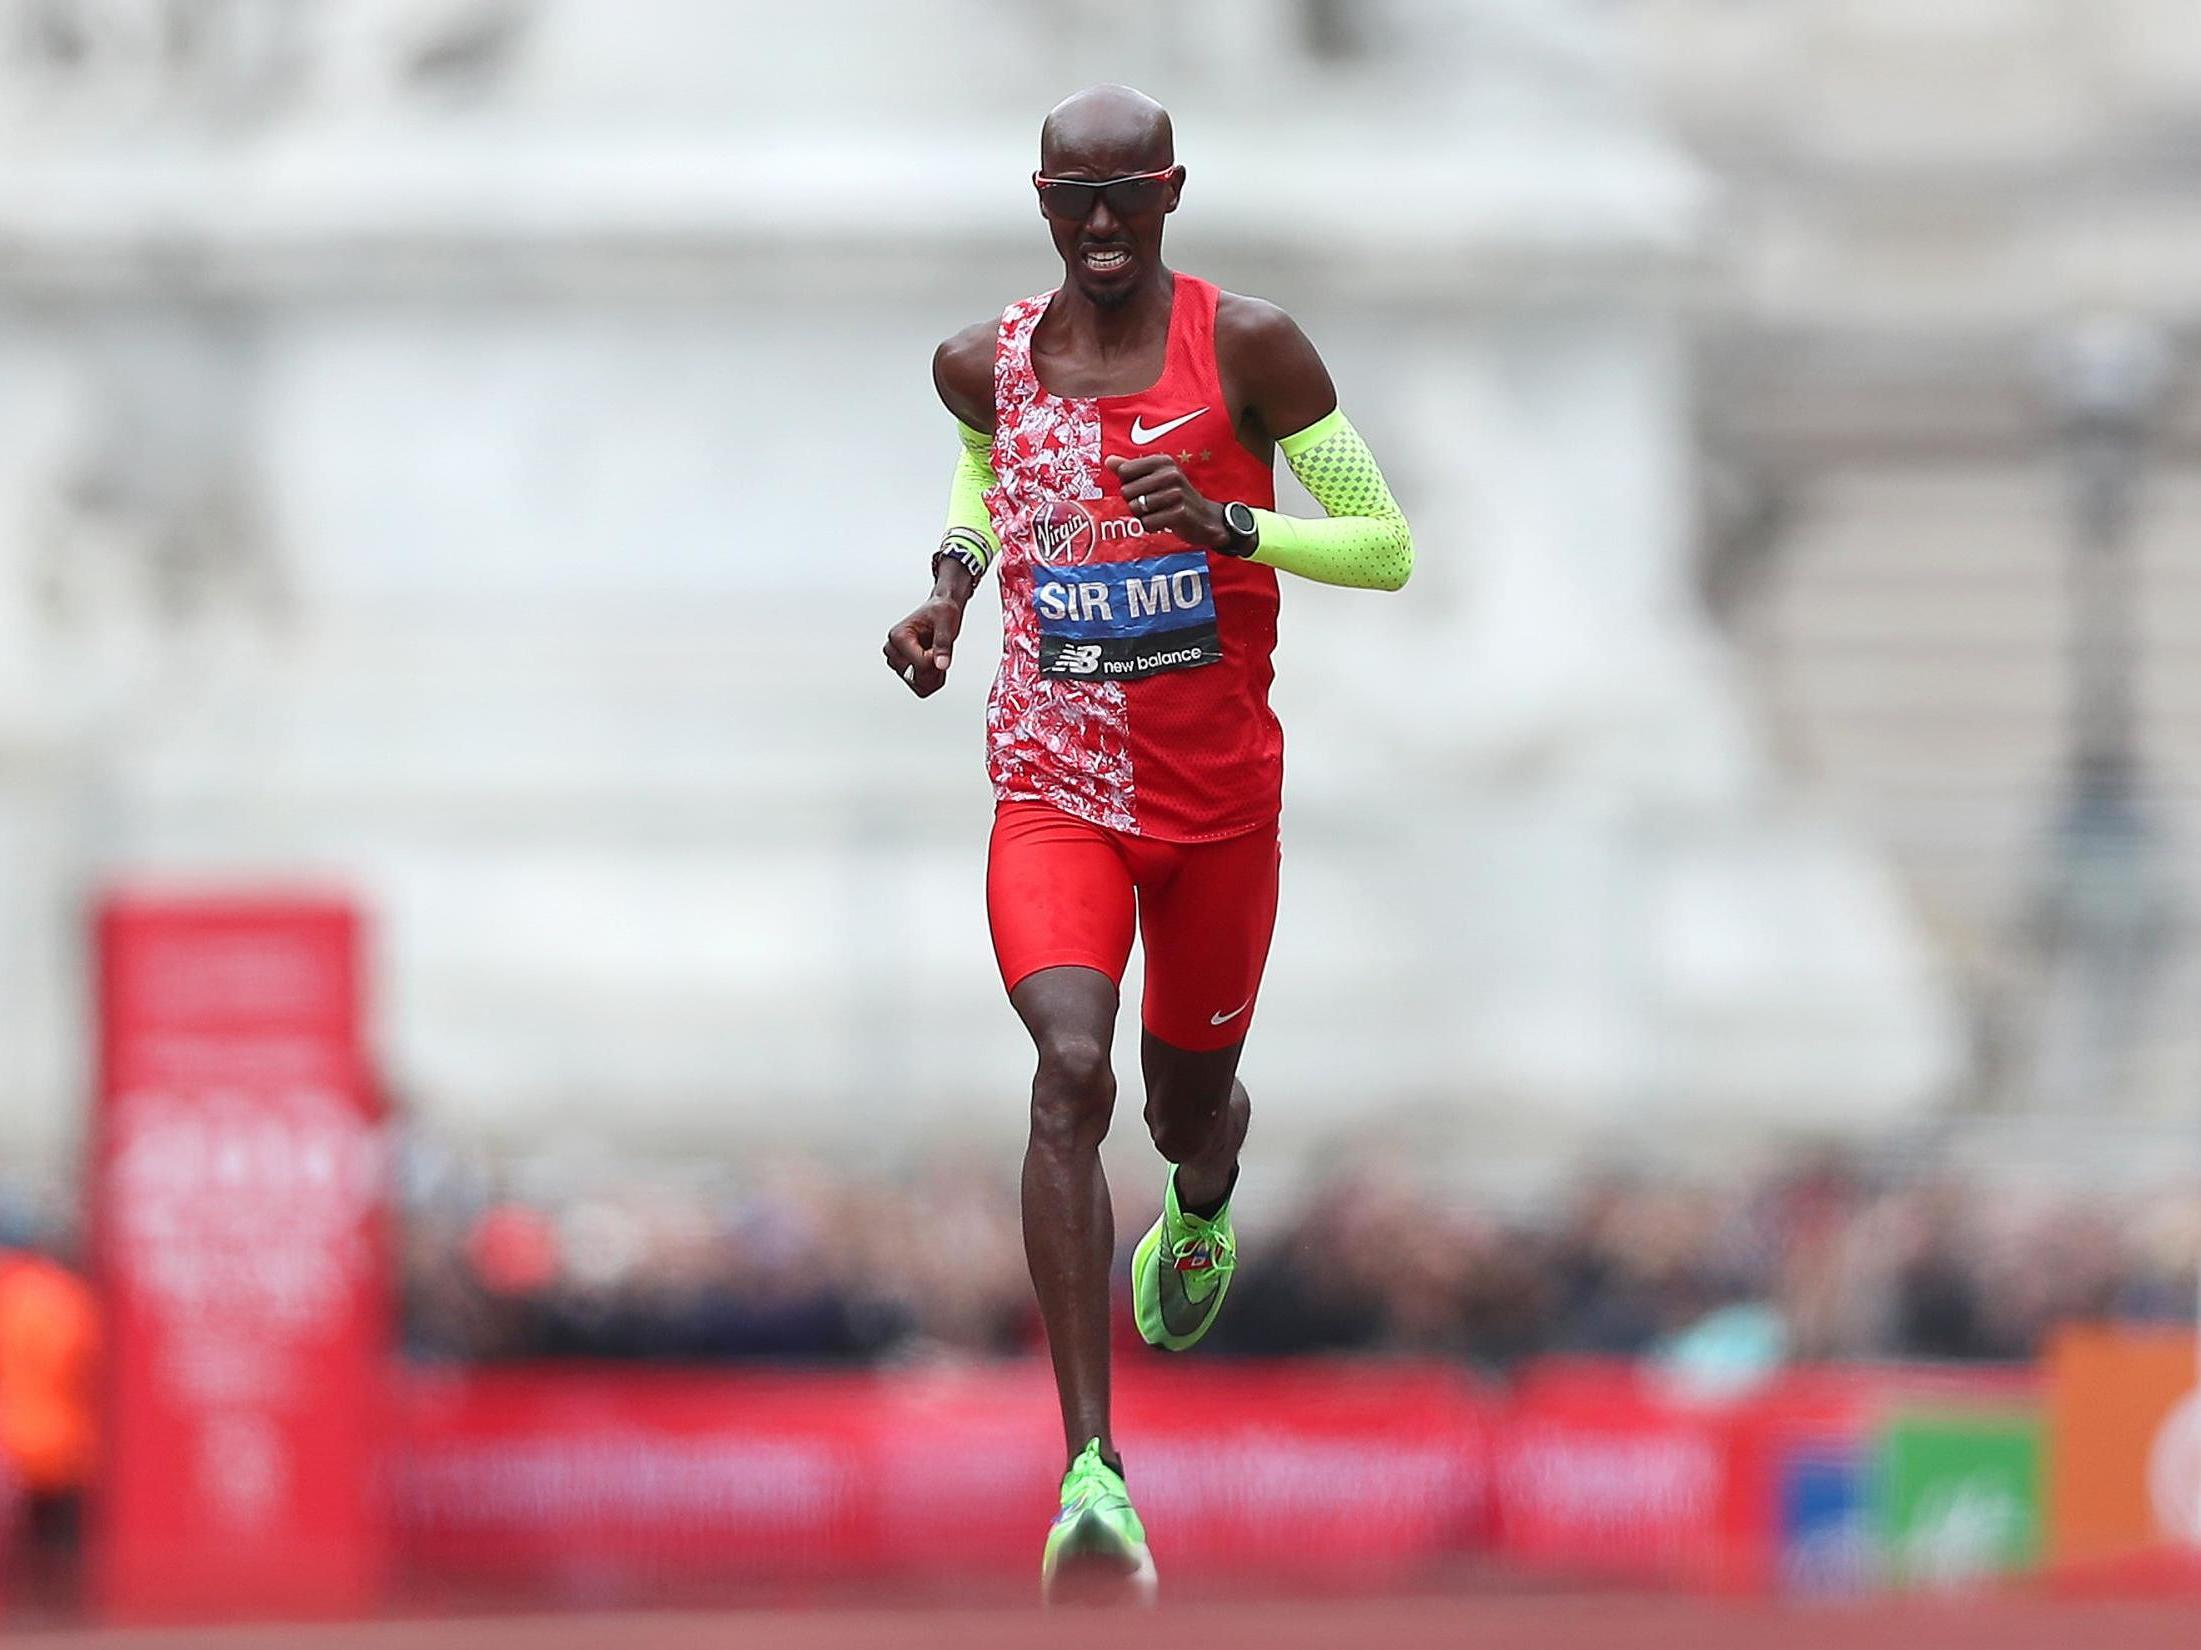 Mo Farah right to turn back on marathon